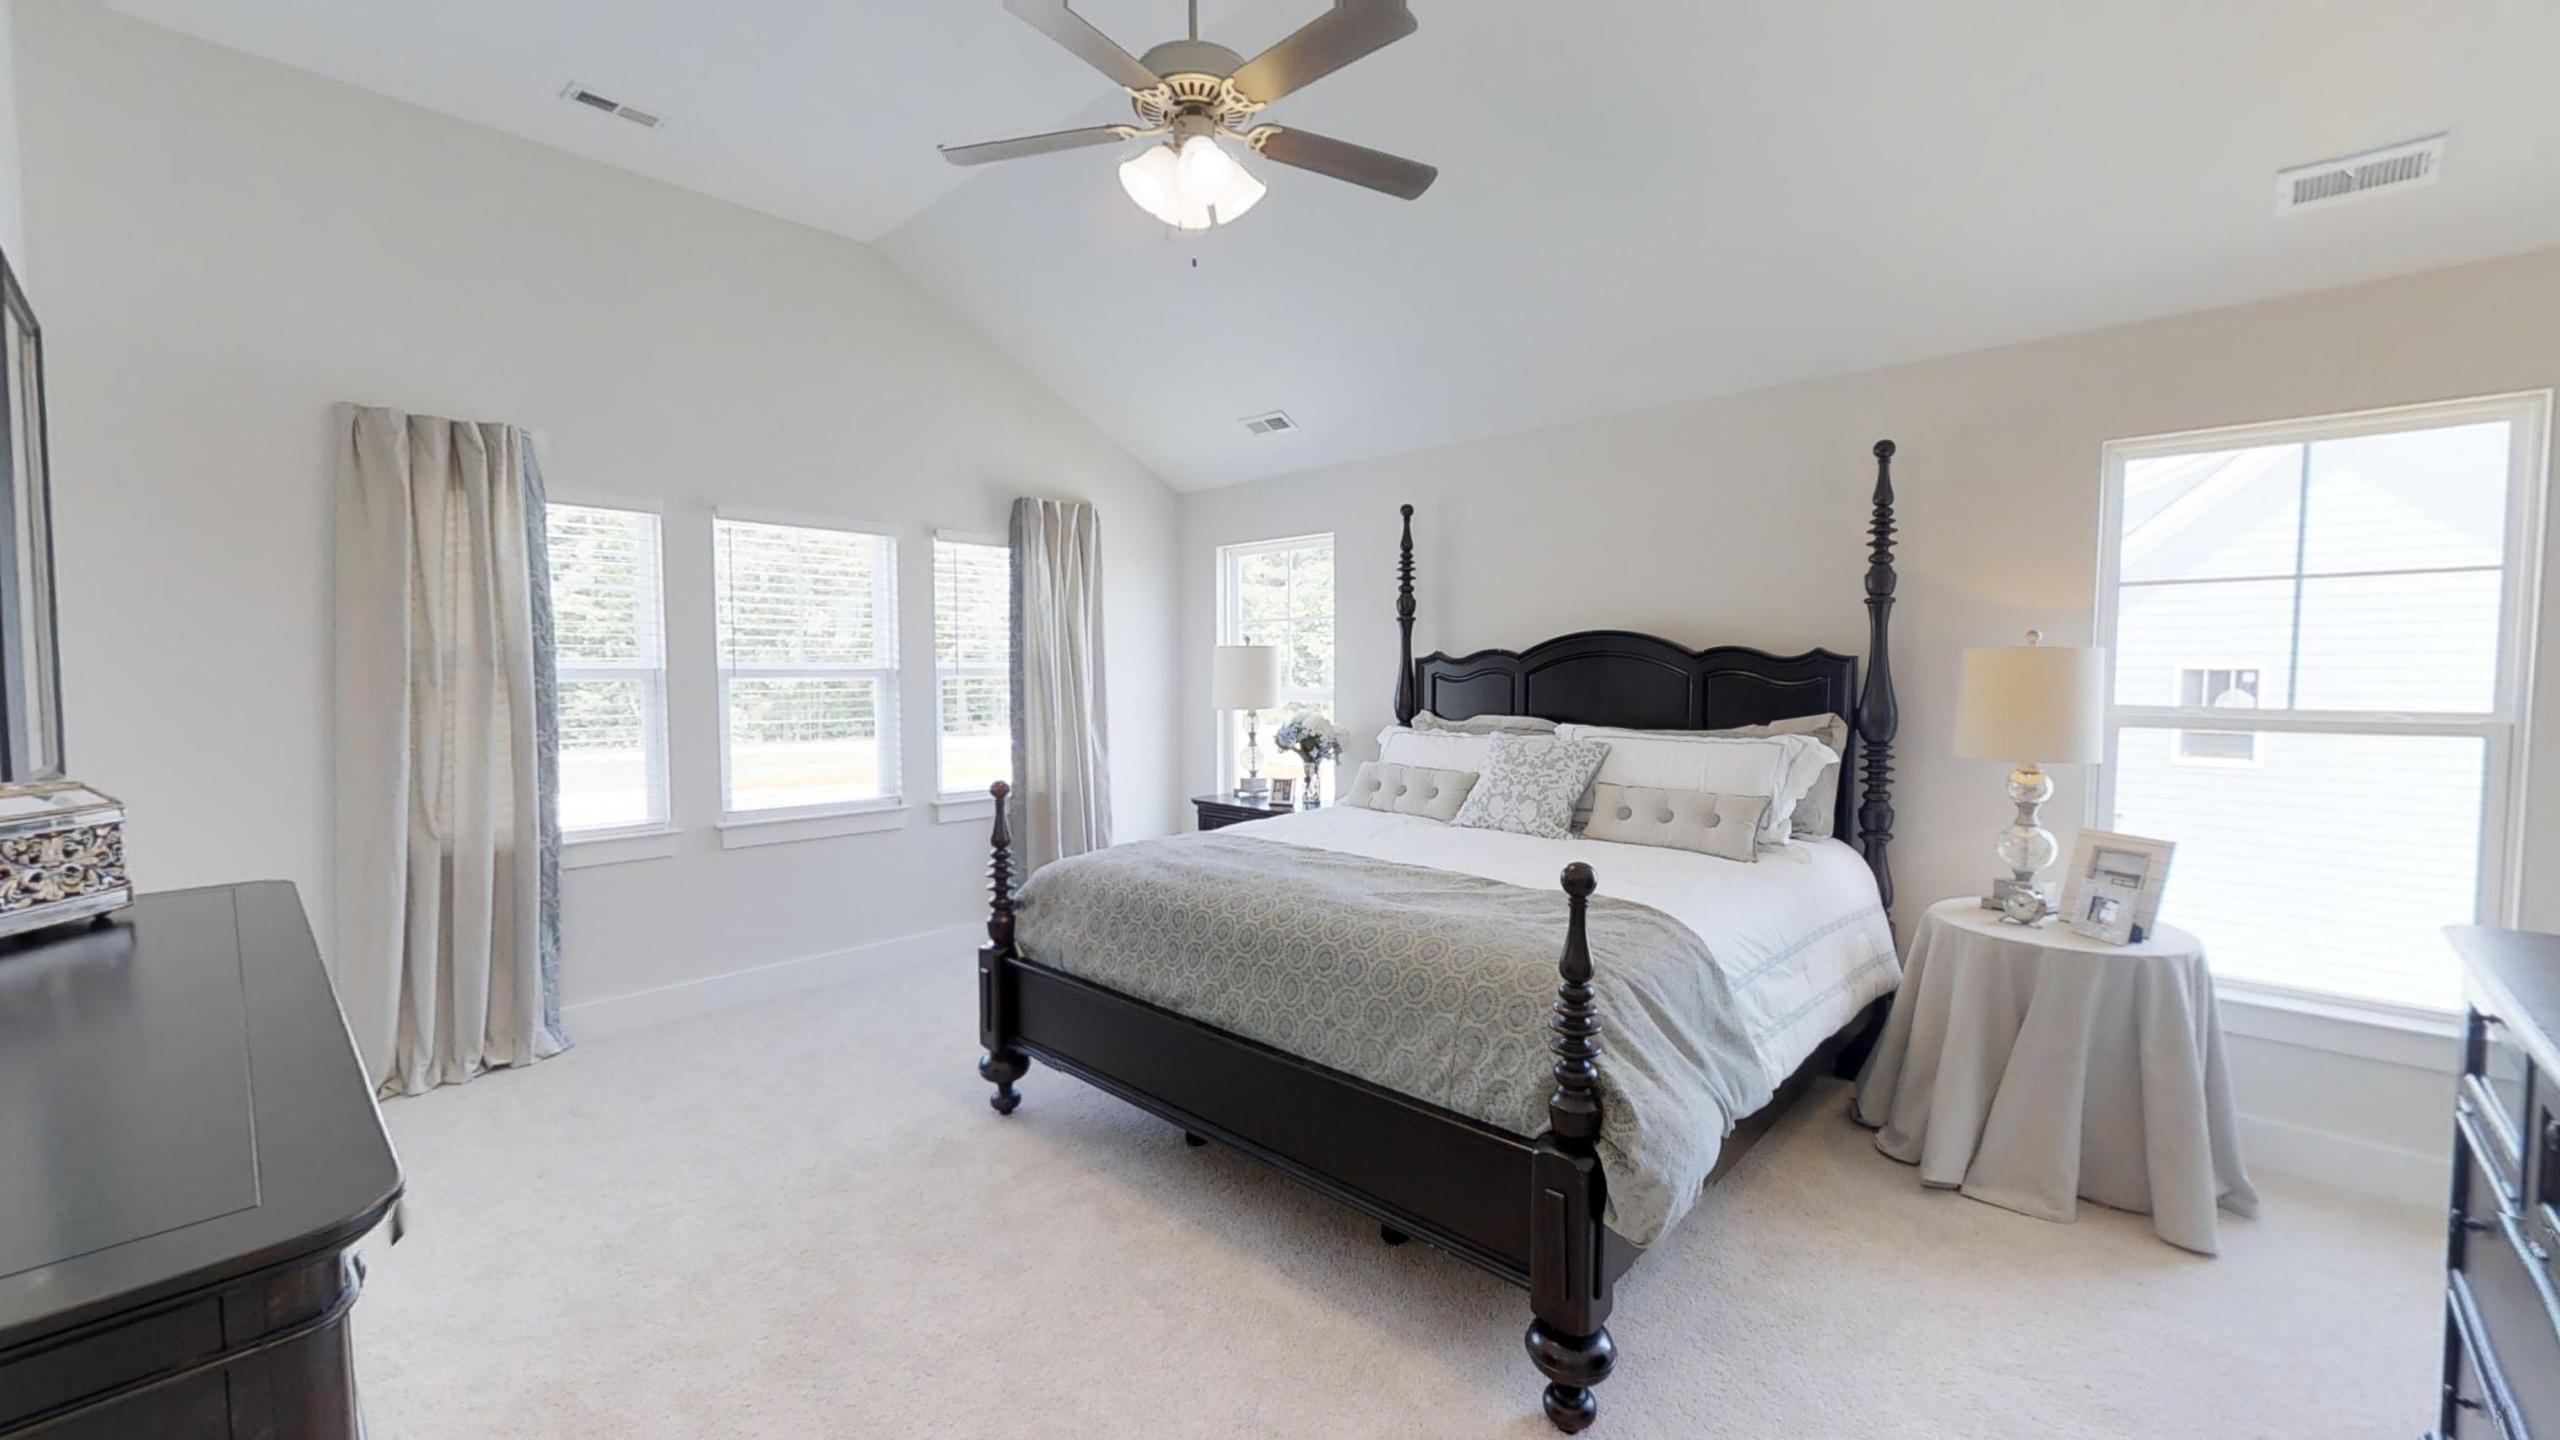 Bedroom featured in the Charlotte By Stephen Alexander Homes in Norfolk-Newport News, VA